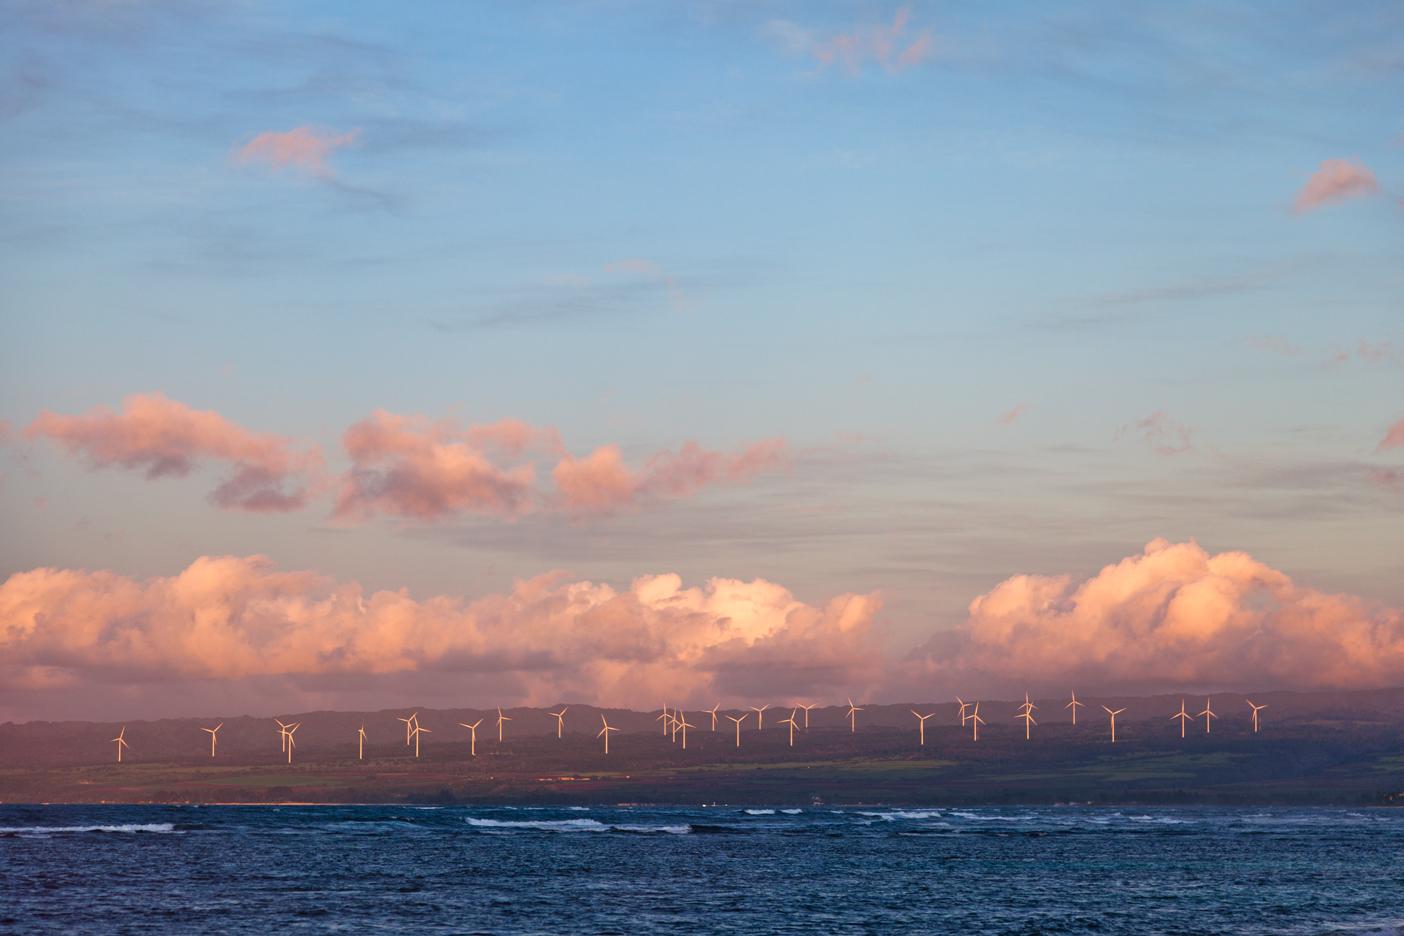 wind-turbines-beach-travel-photographer.jpg